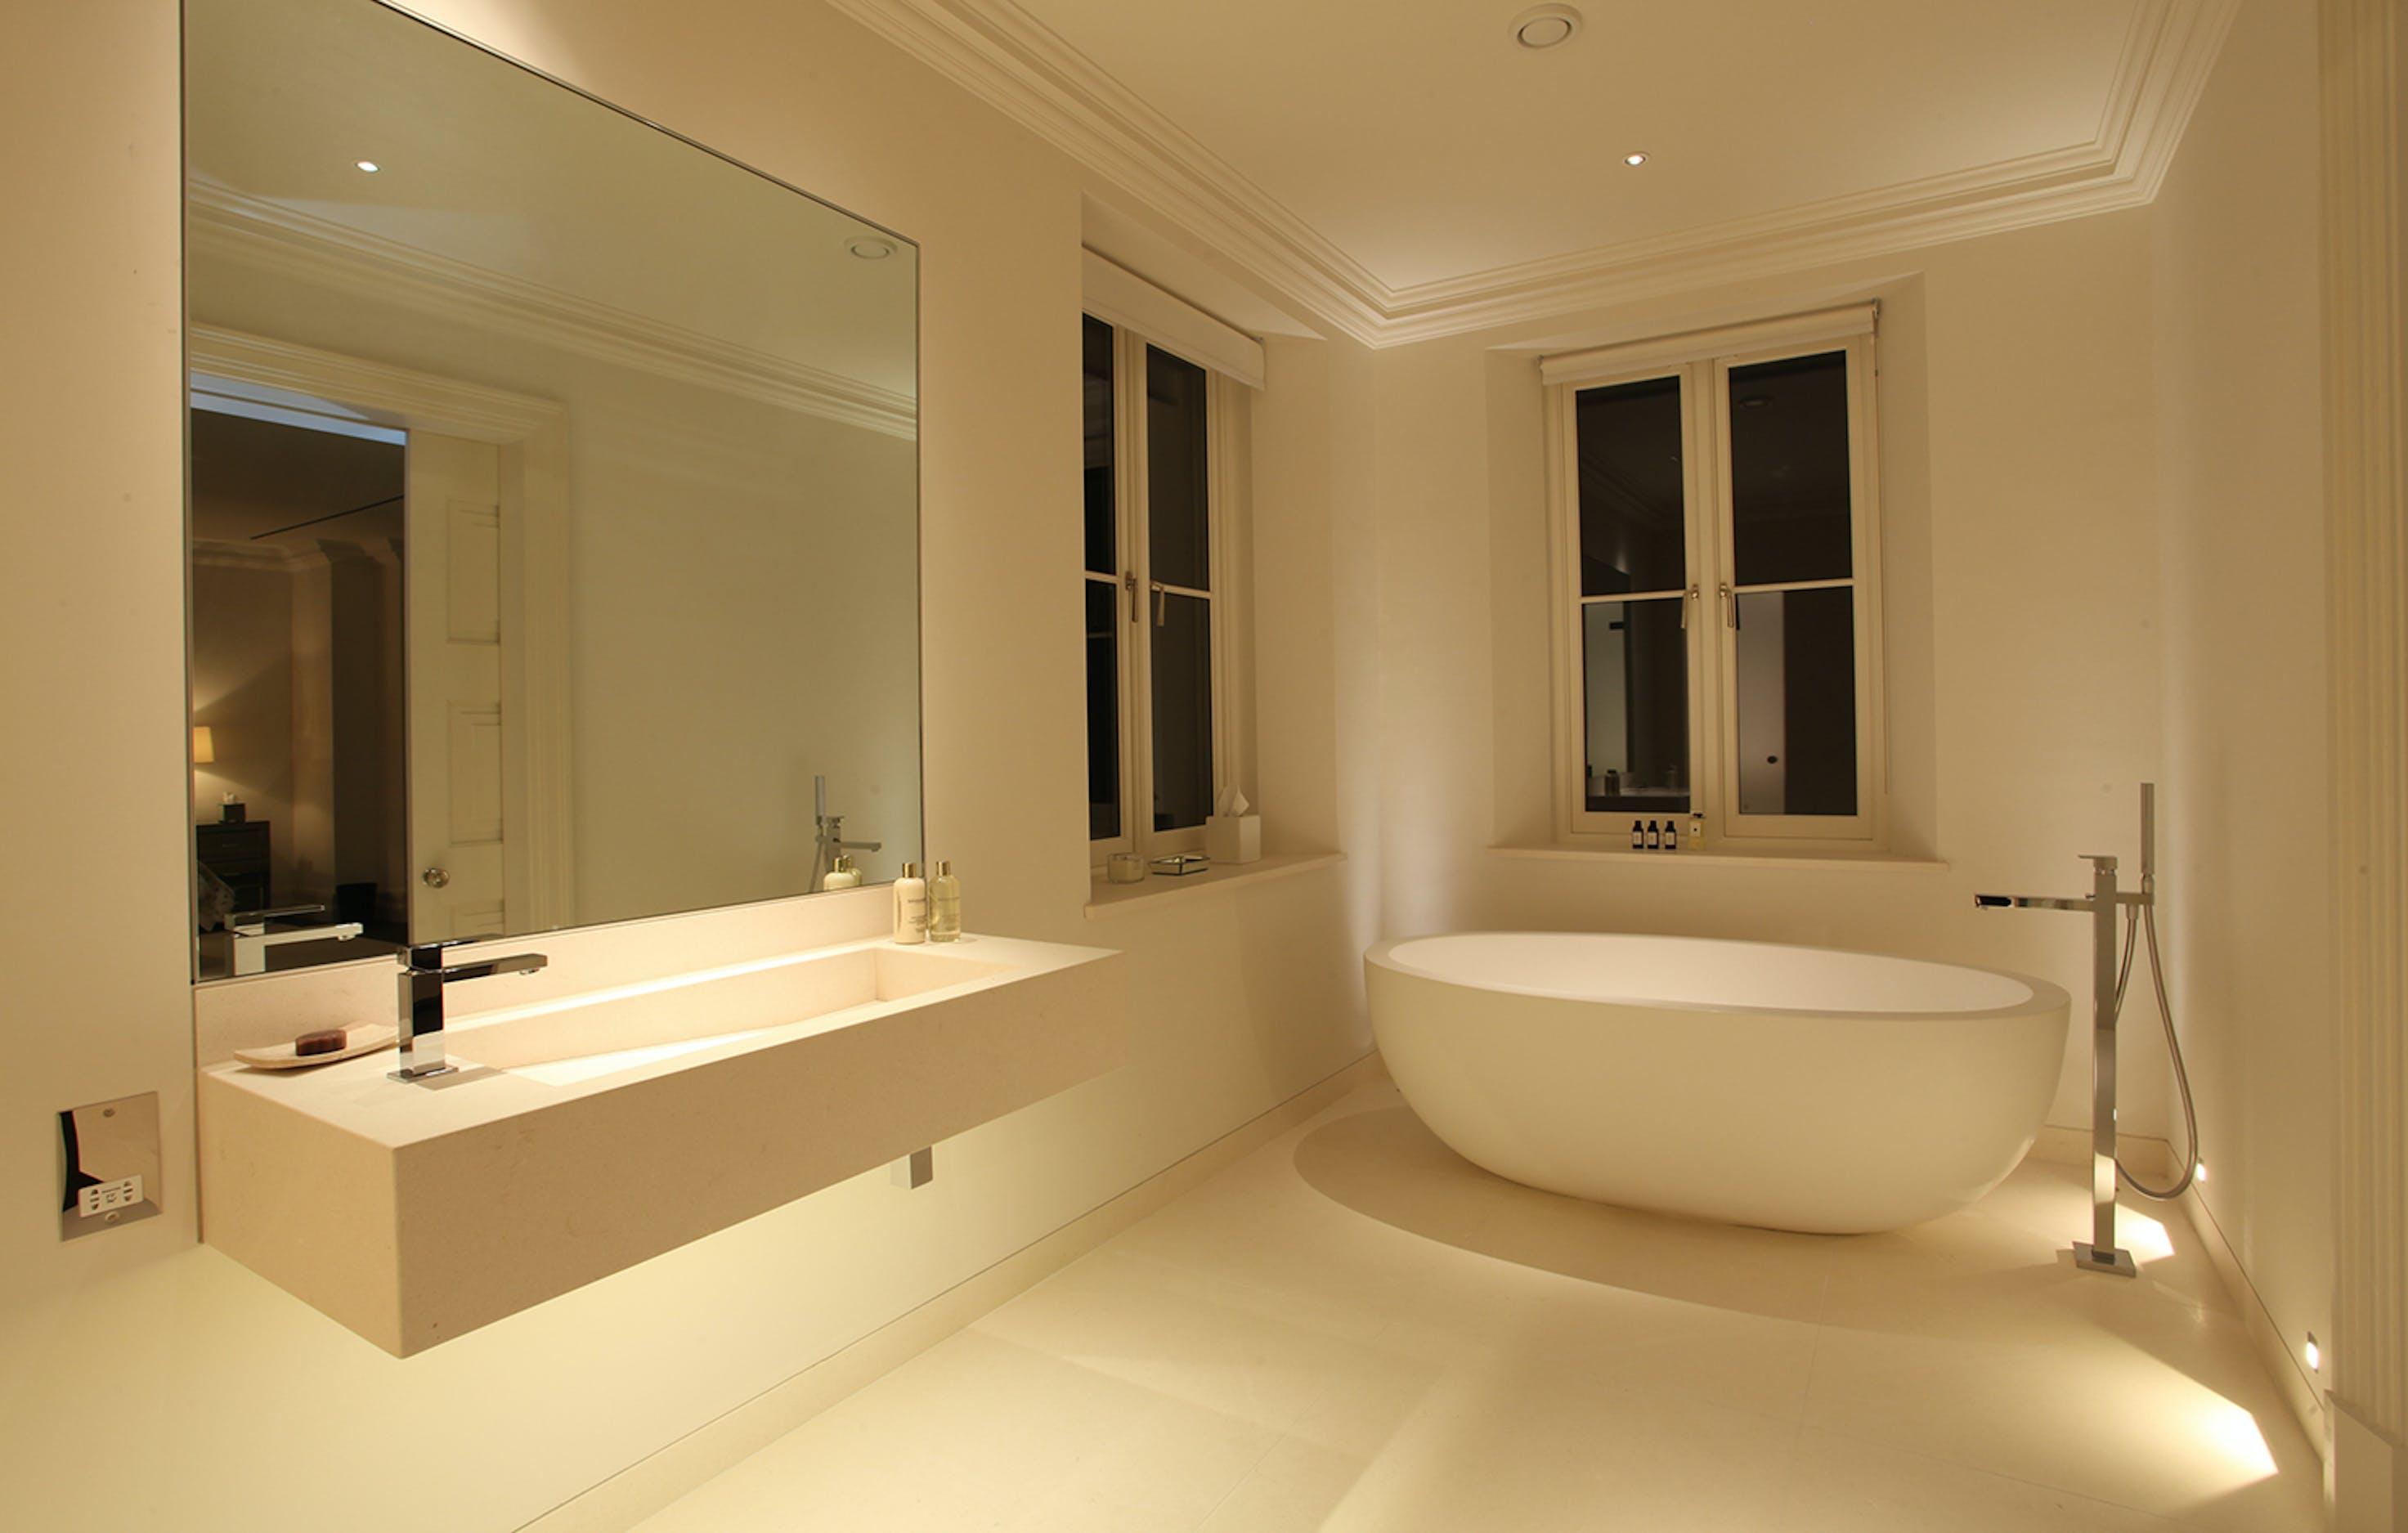 Monotone bathroom lighting